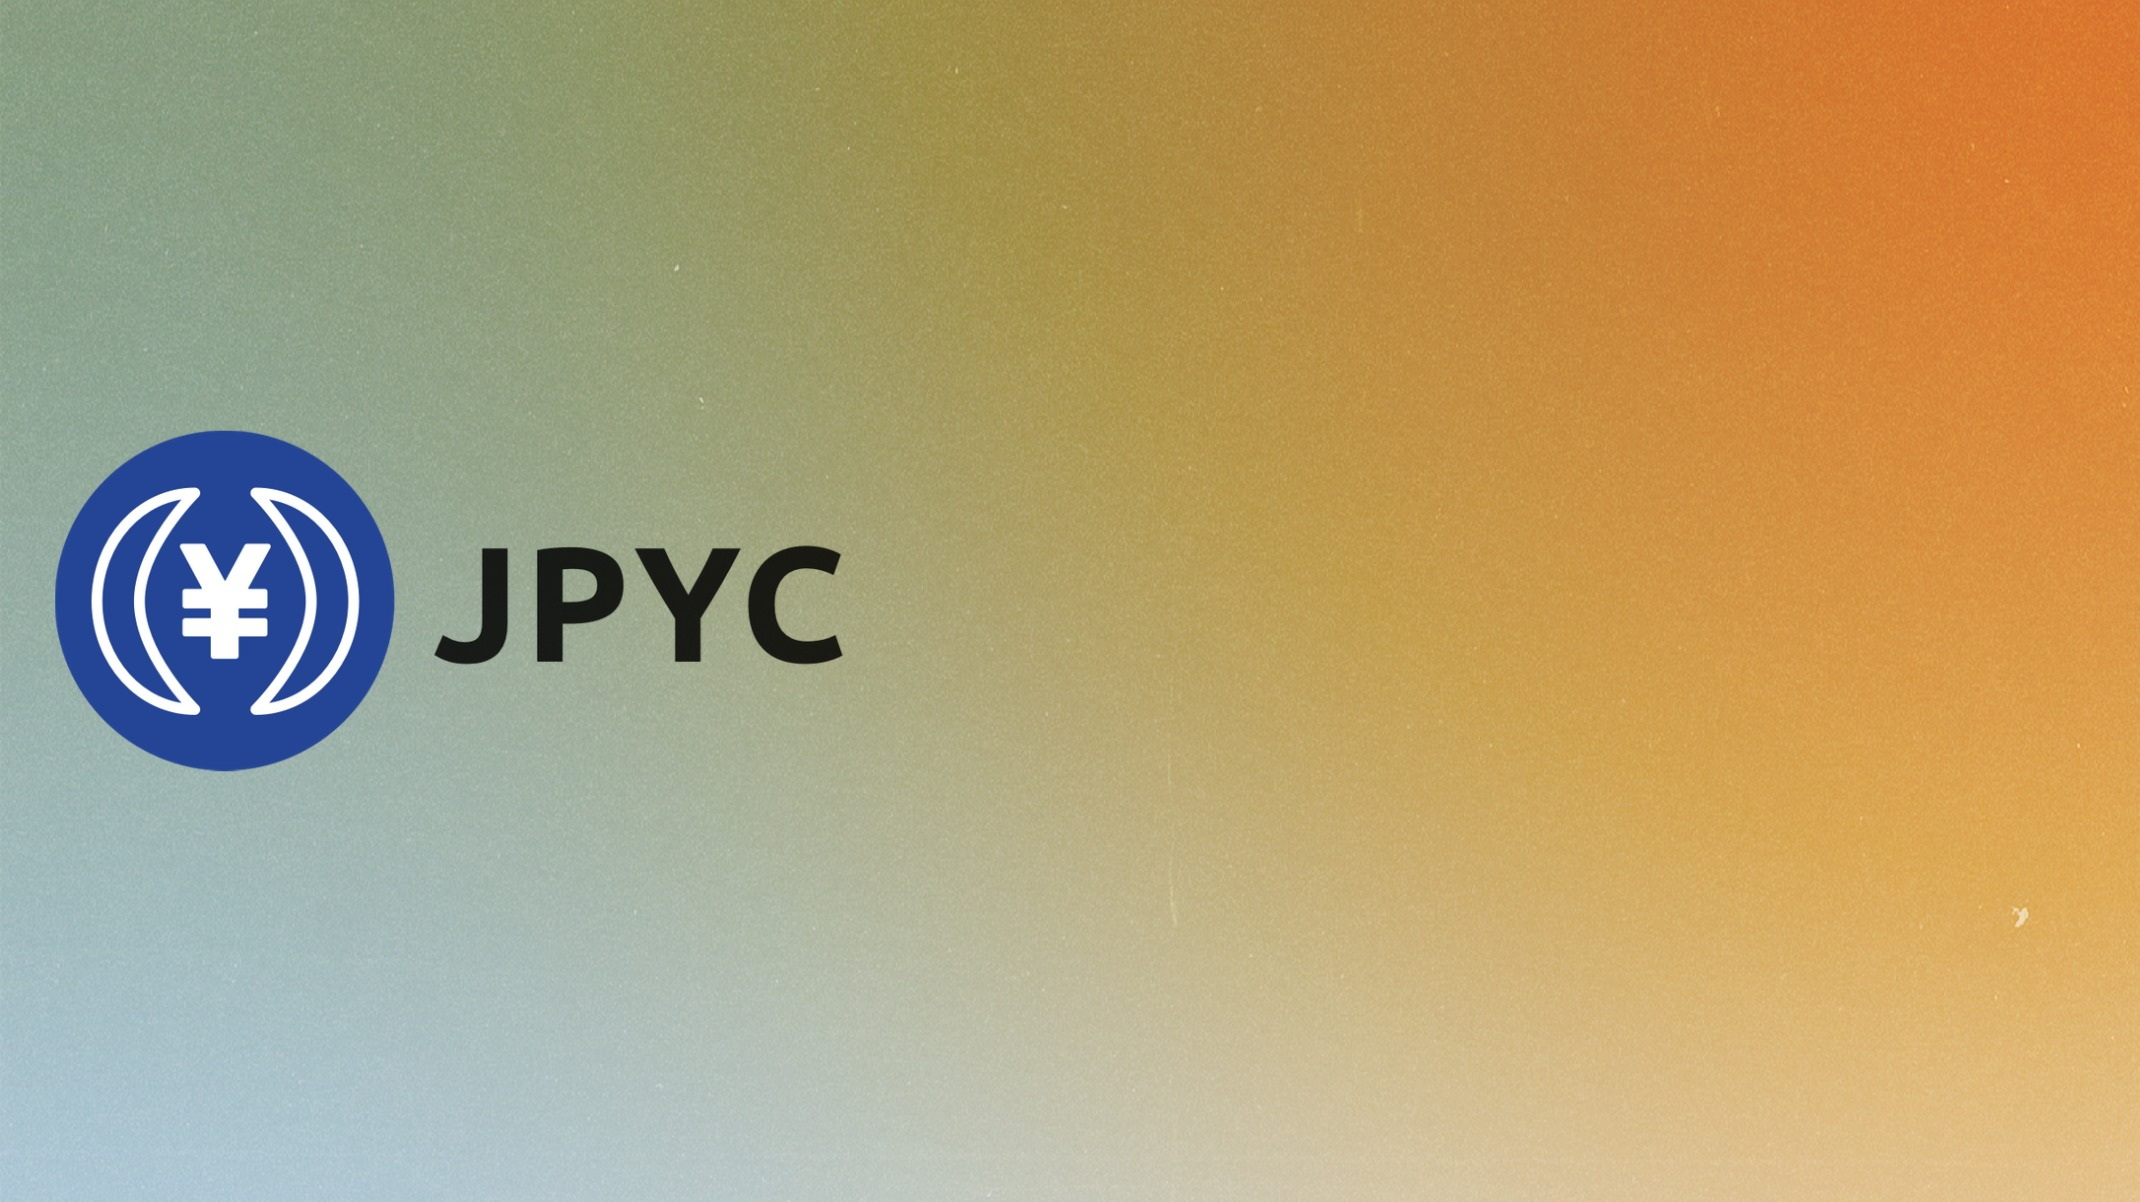 JPYC(JPYCoin)とは?購入方法やAmazonでの使い方を詳しく解説!